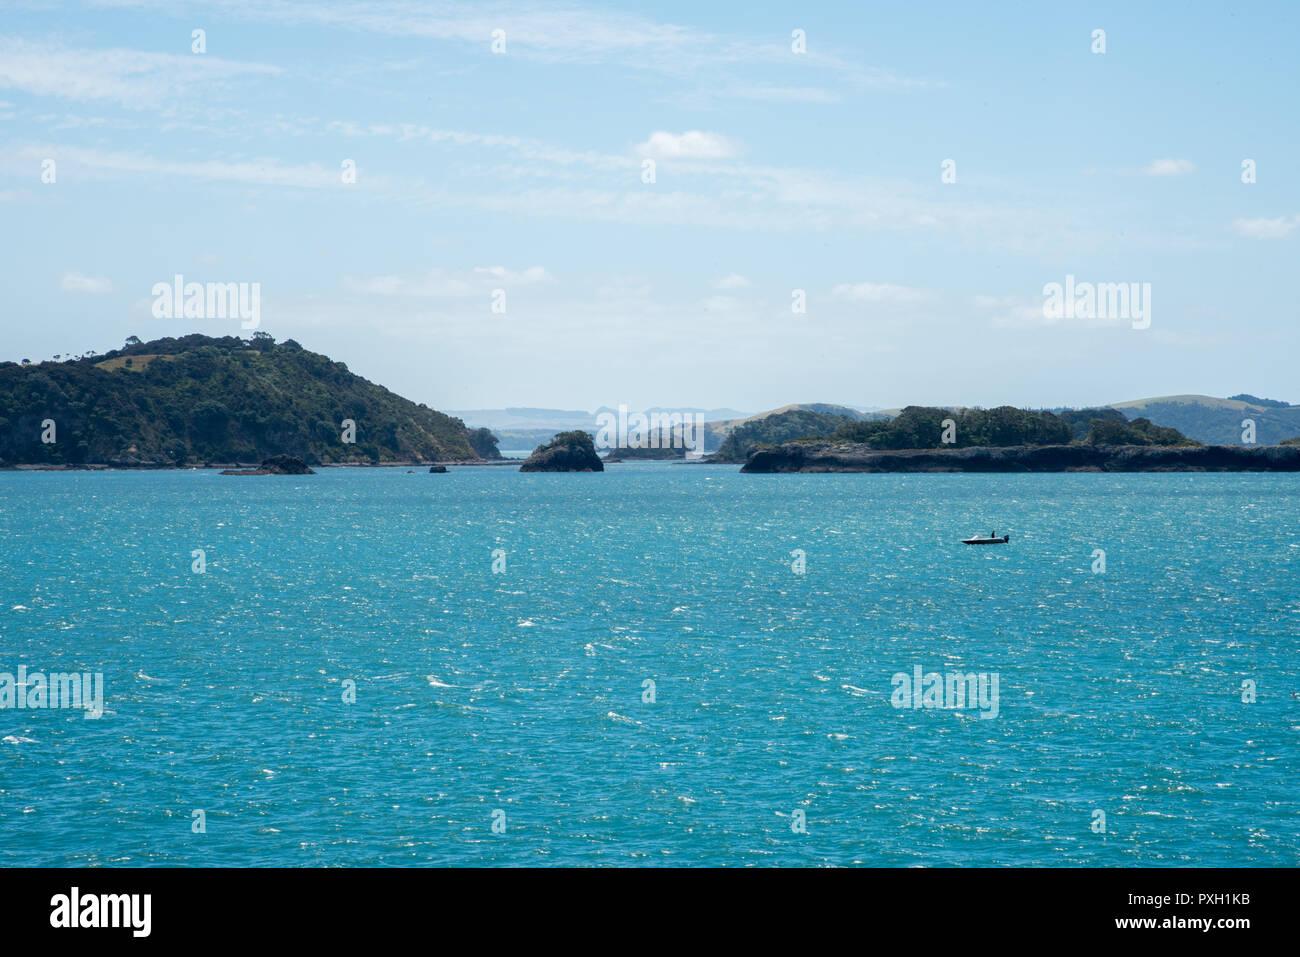 Bay of Islands, North Island, New Zealand-December 18,2016: Nautical vessel in the turquoise Tasman Sea in the Bay of Islands, New Zealand - Stock Image